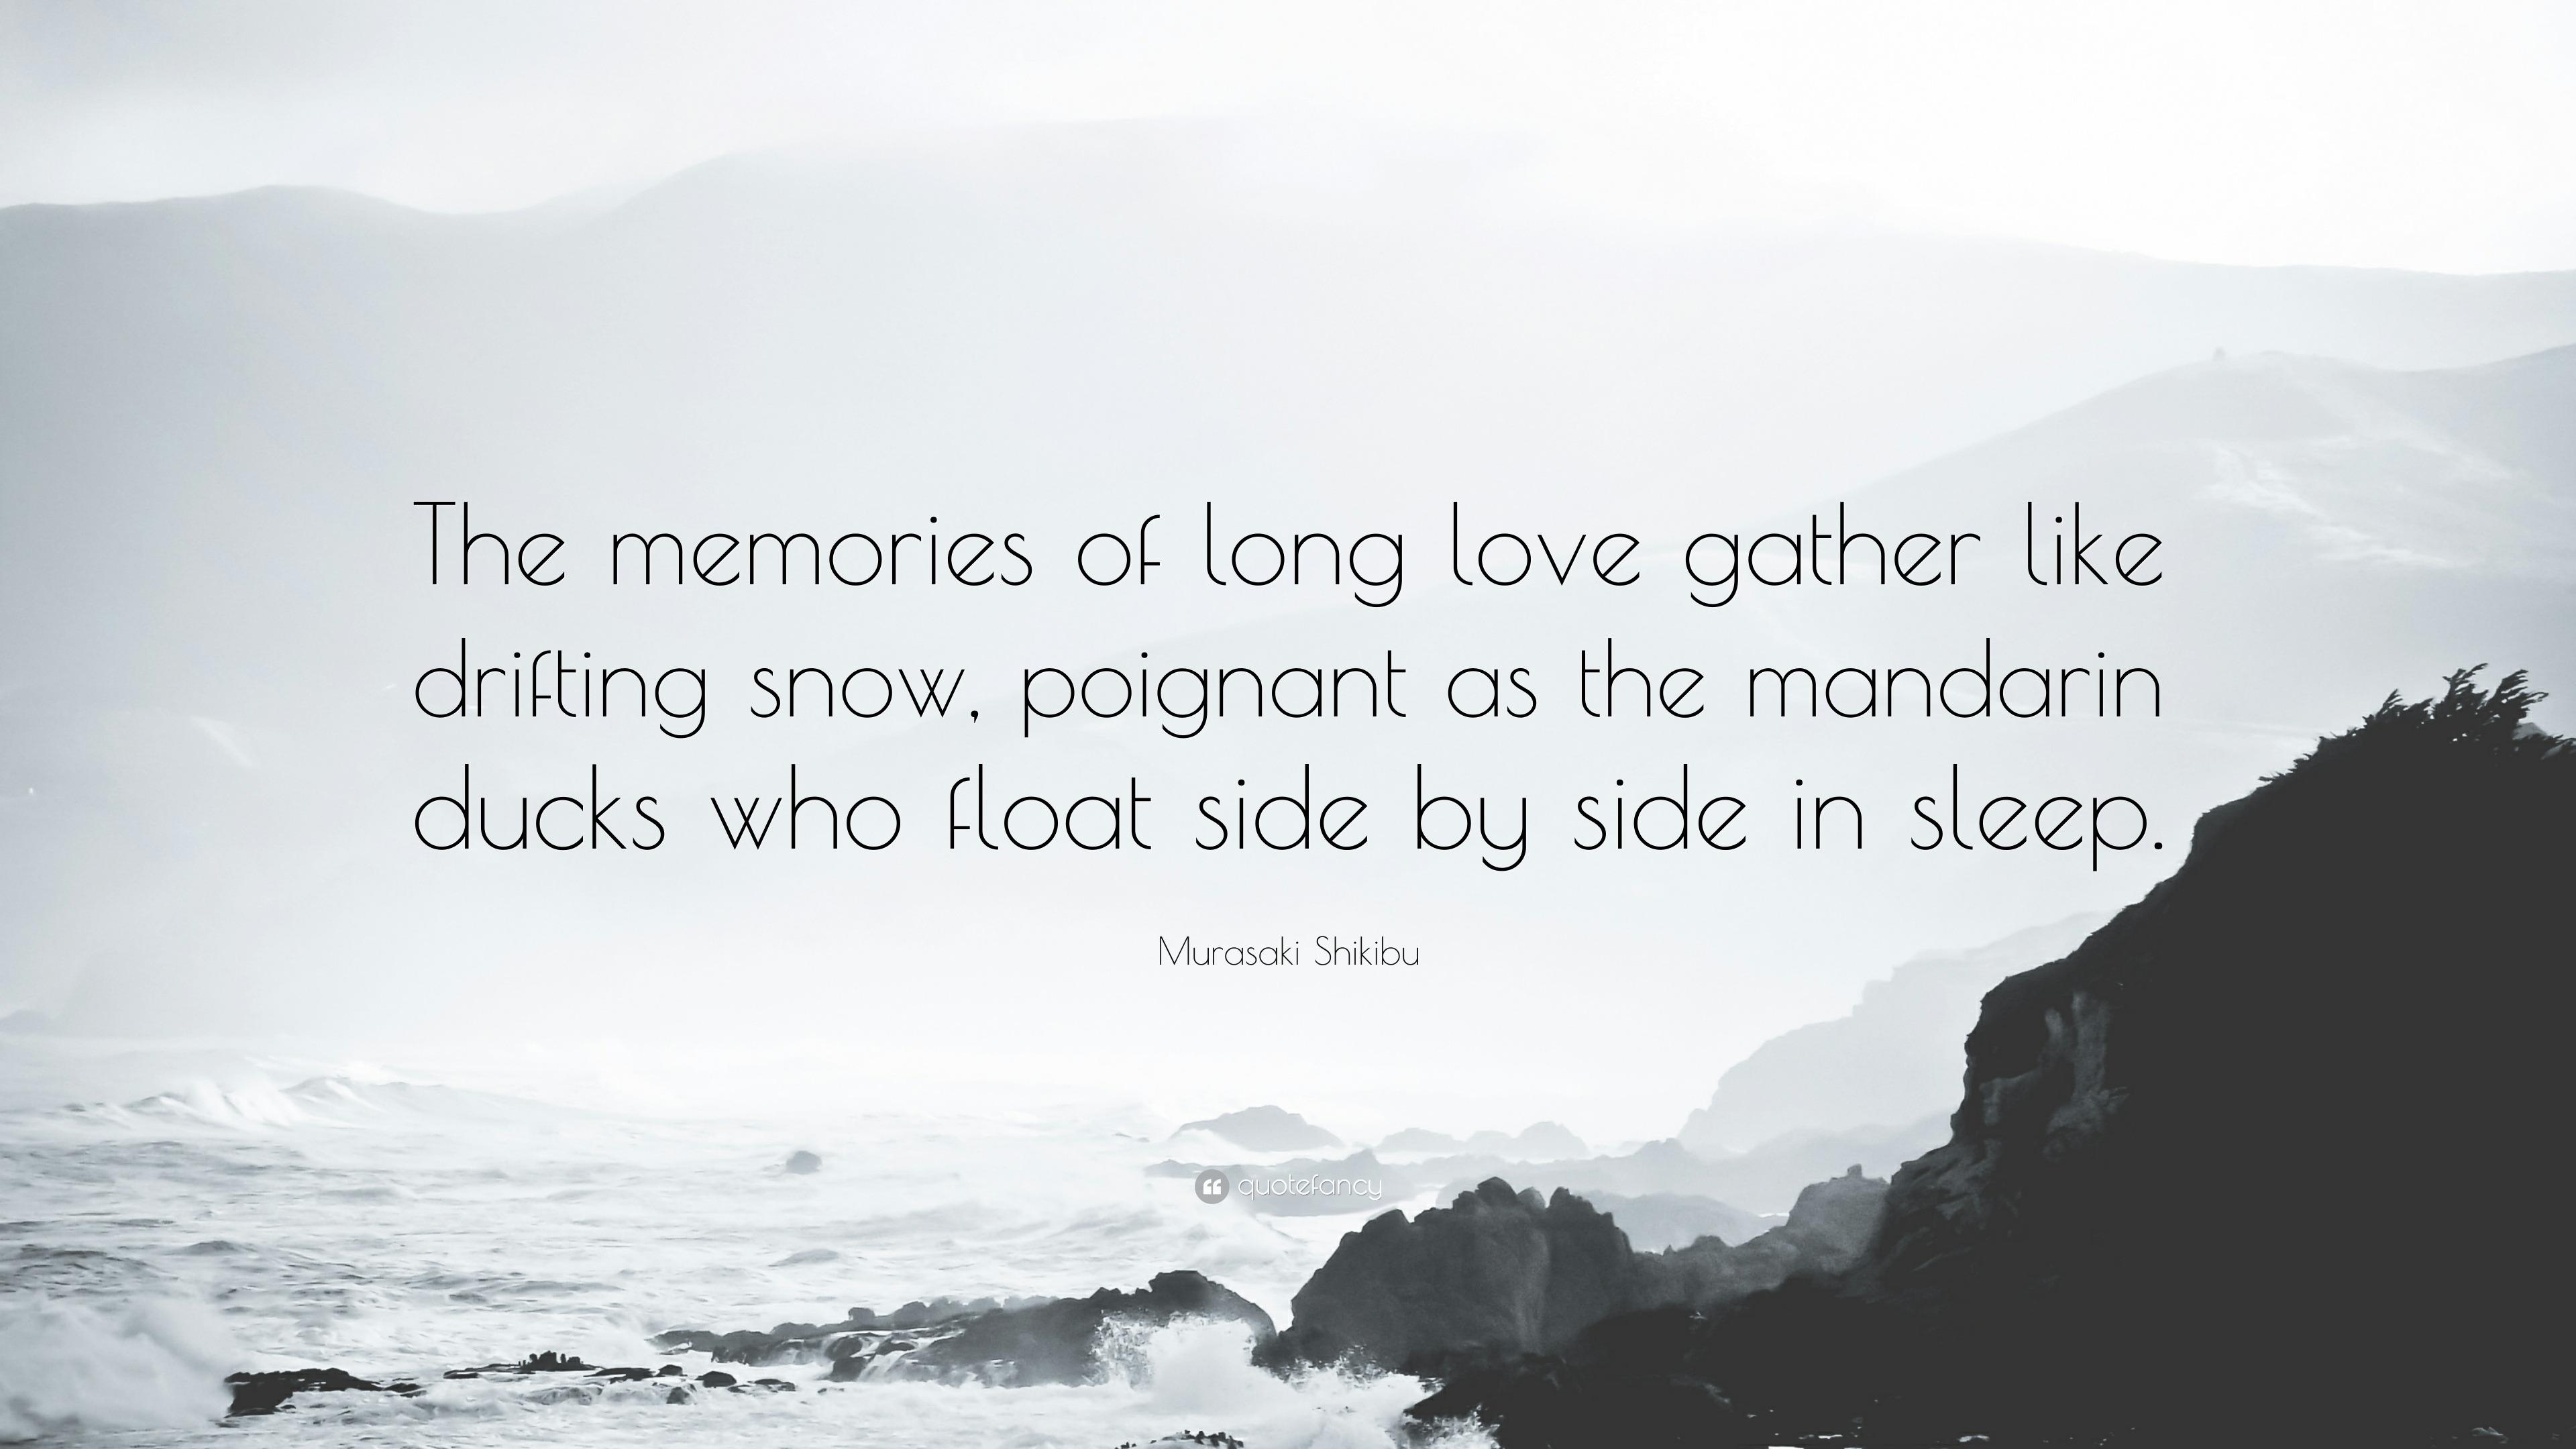 Murasaki Shikibu Quote The Memories Of Long Love Gather Like Drifting Snow Poignant